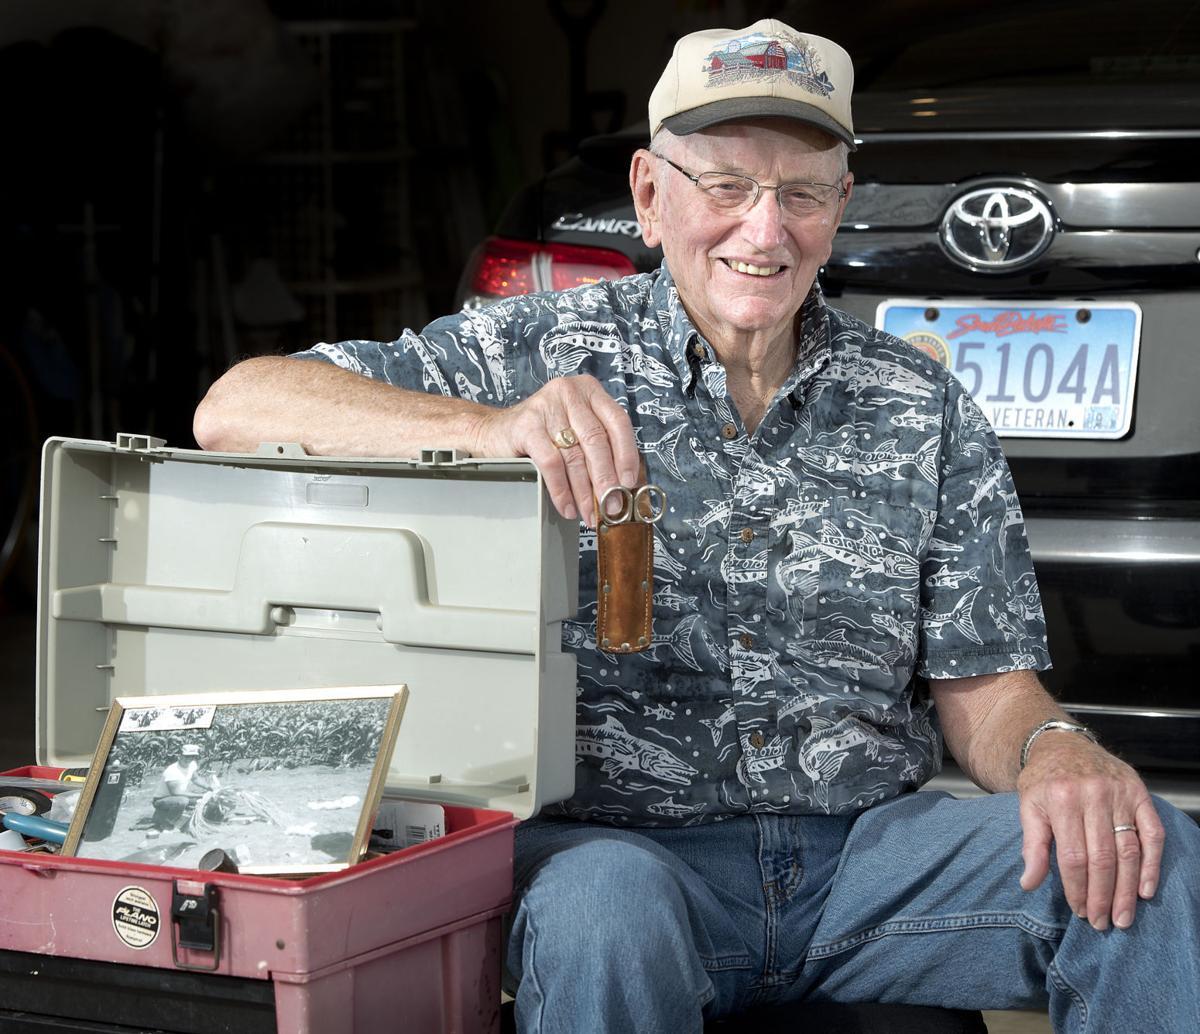 Korean War veteran Bob Stouffer